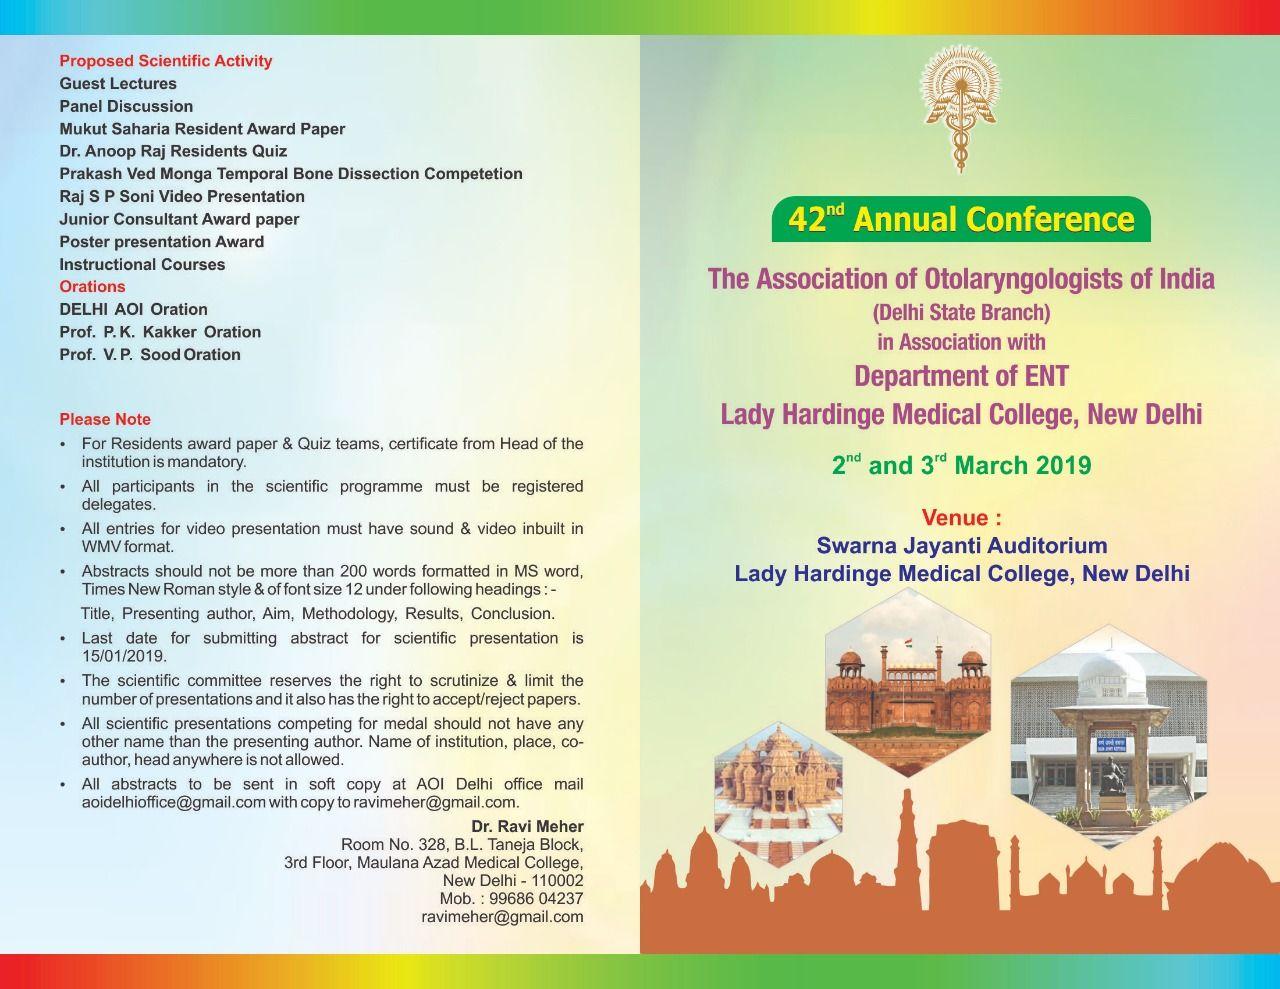 Association of Otolaryngologists of India: November 2018